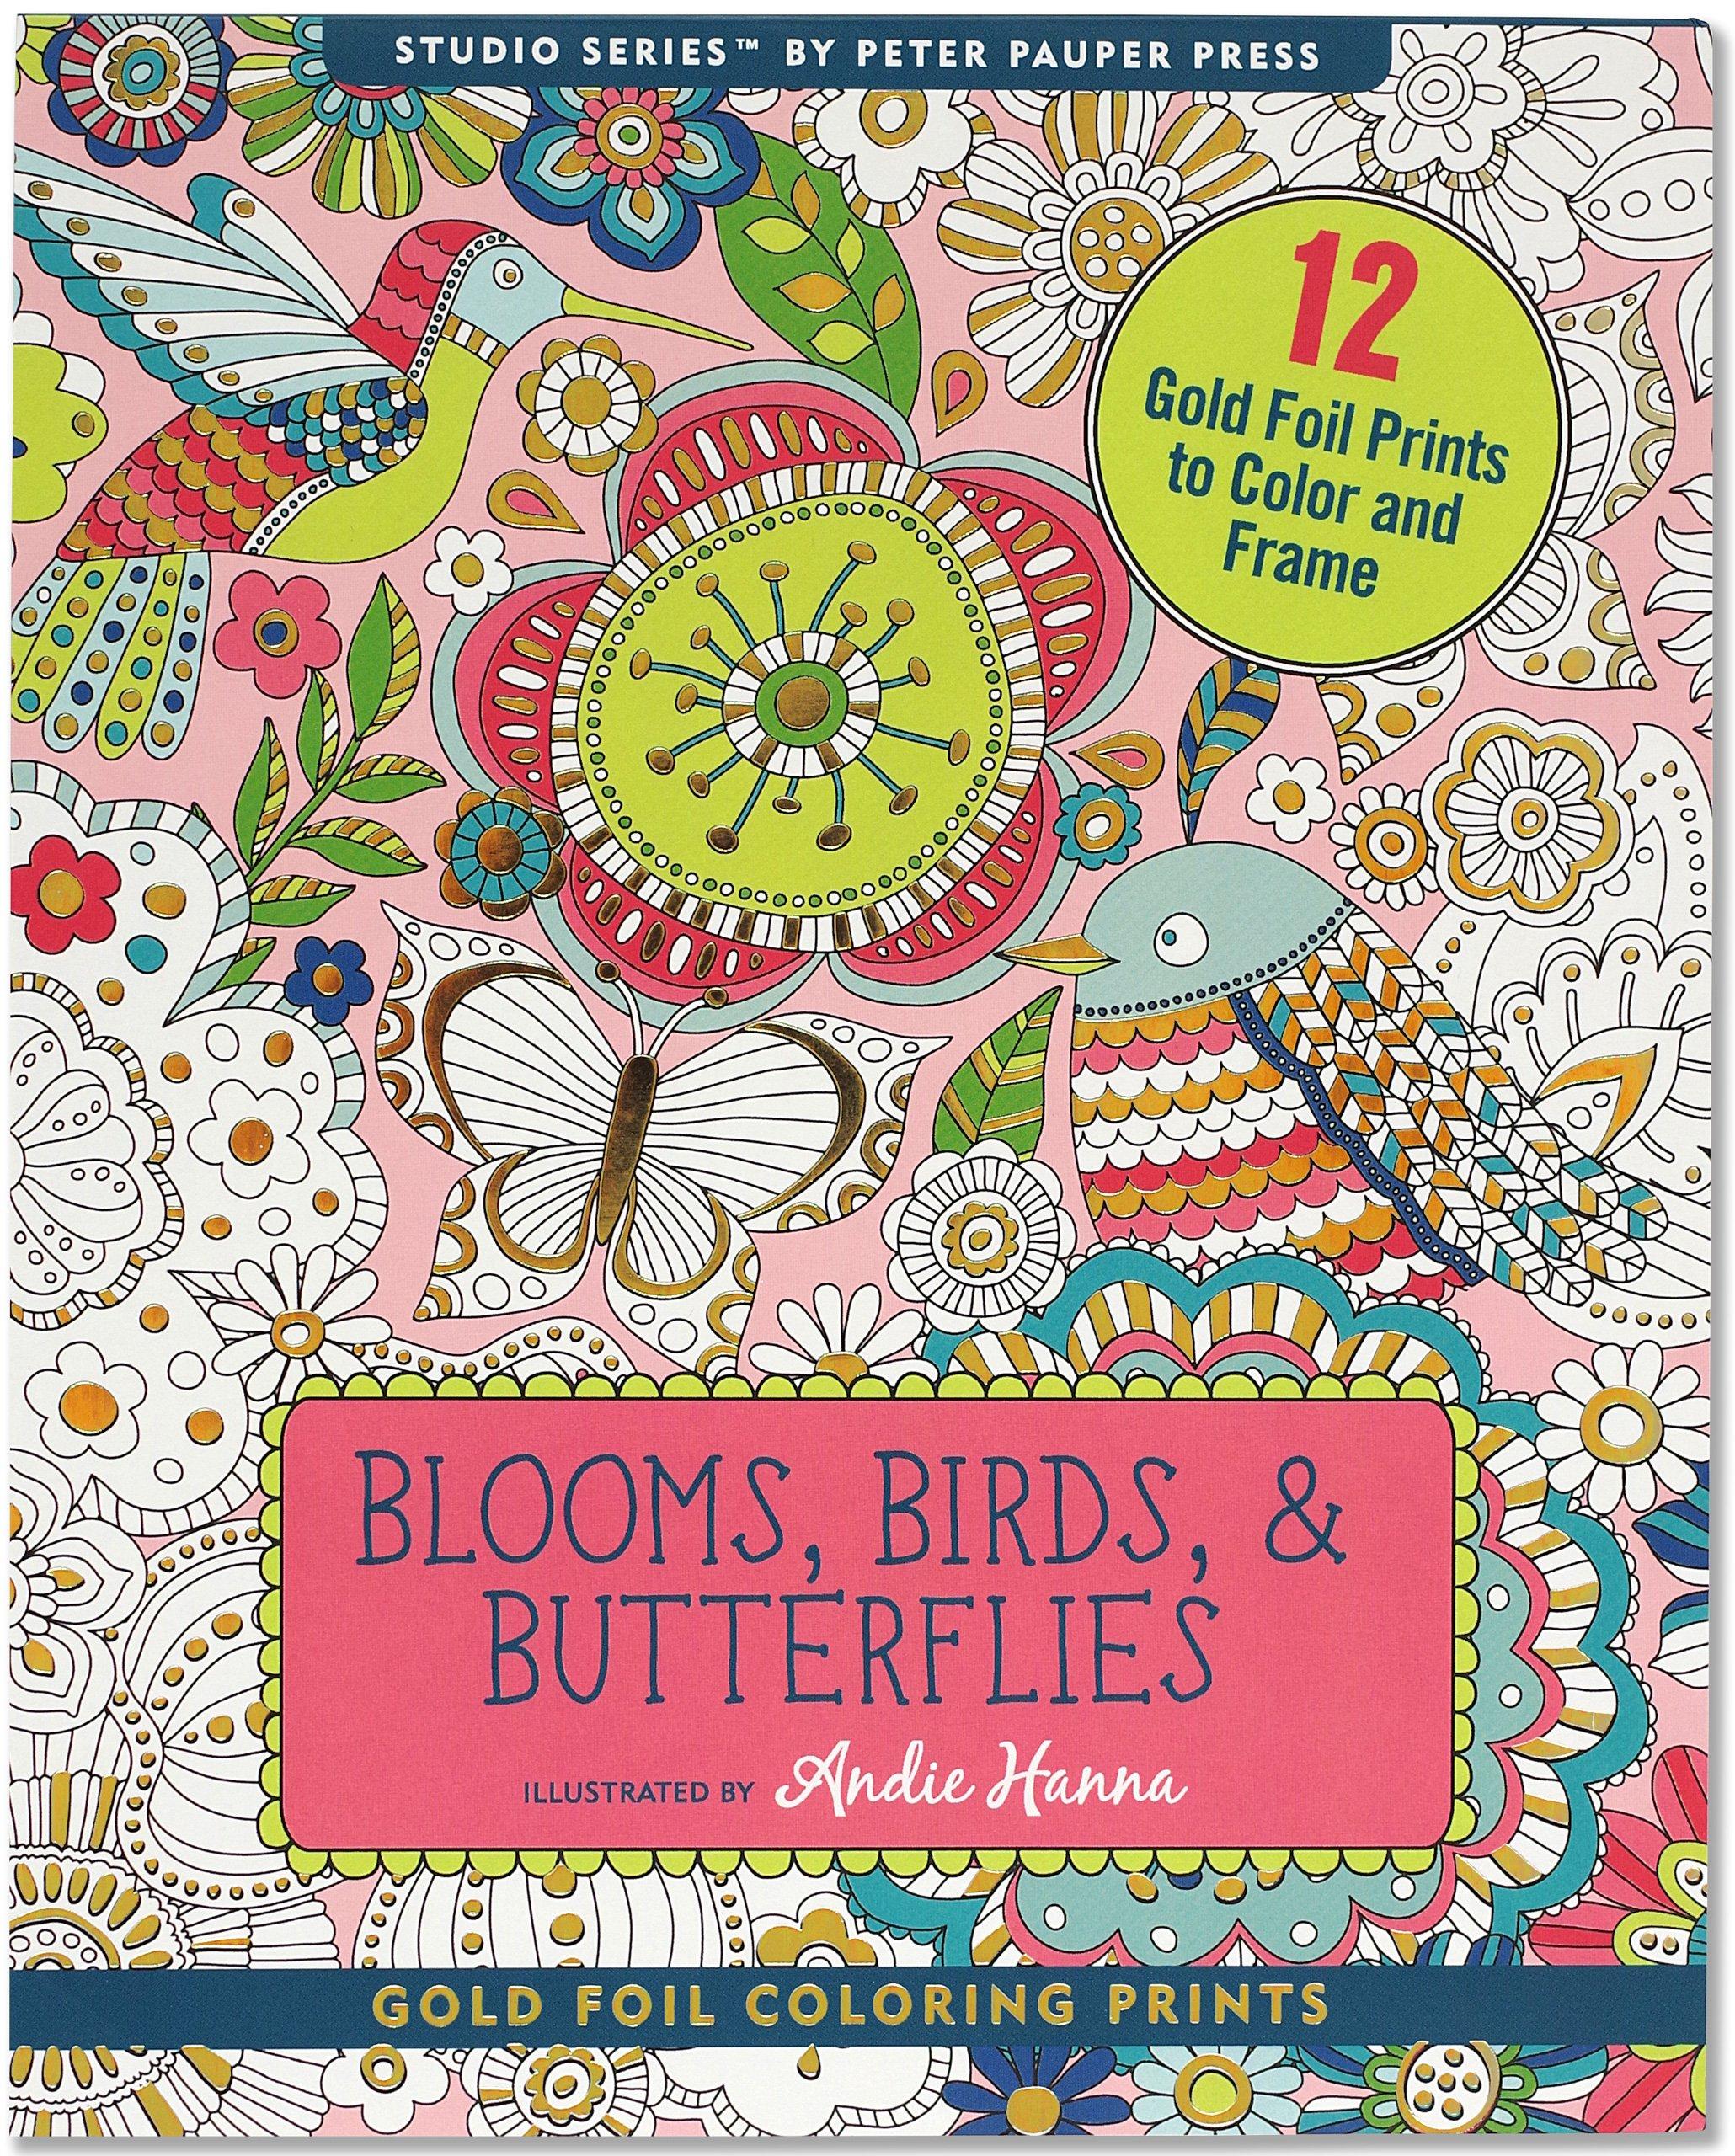 Blooms, Birds, & Butterflies Foiled Coloring Prints (12 frame-worthy designs) (Studio Series Gold Foil Coloring Prints) PDF